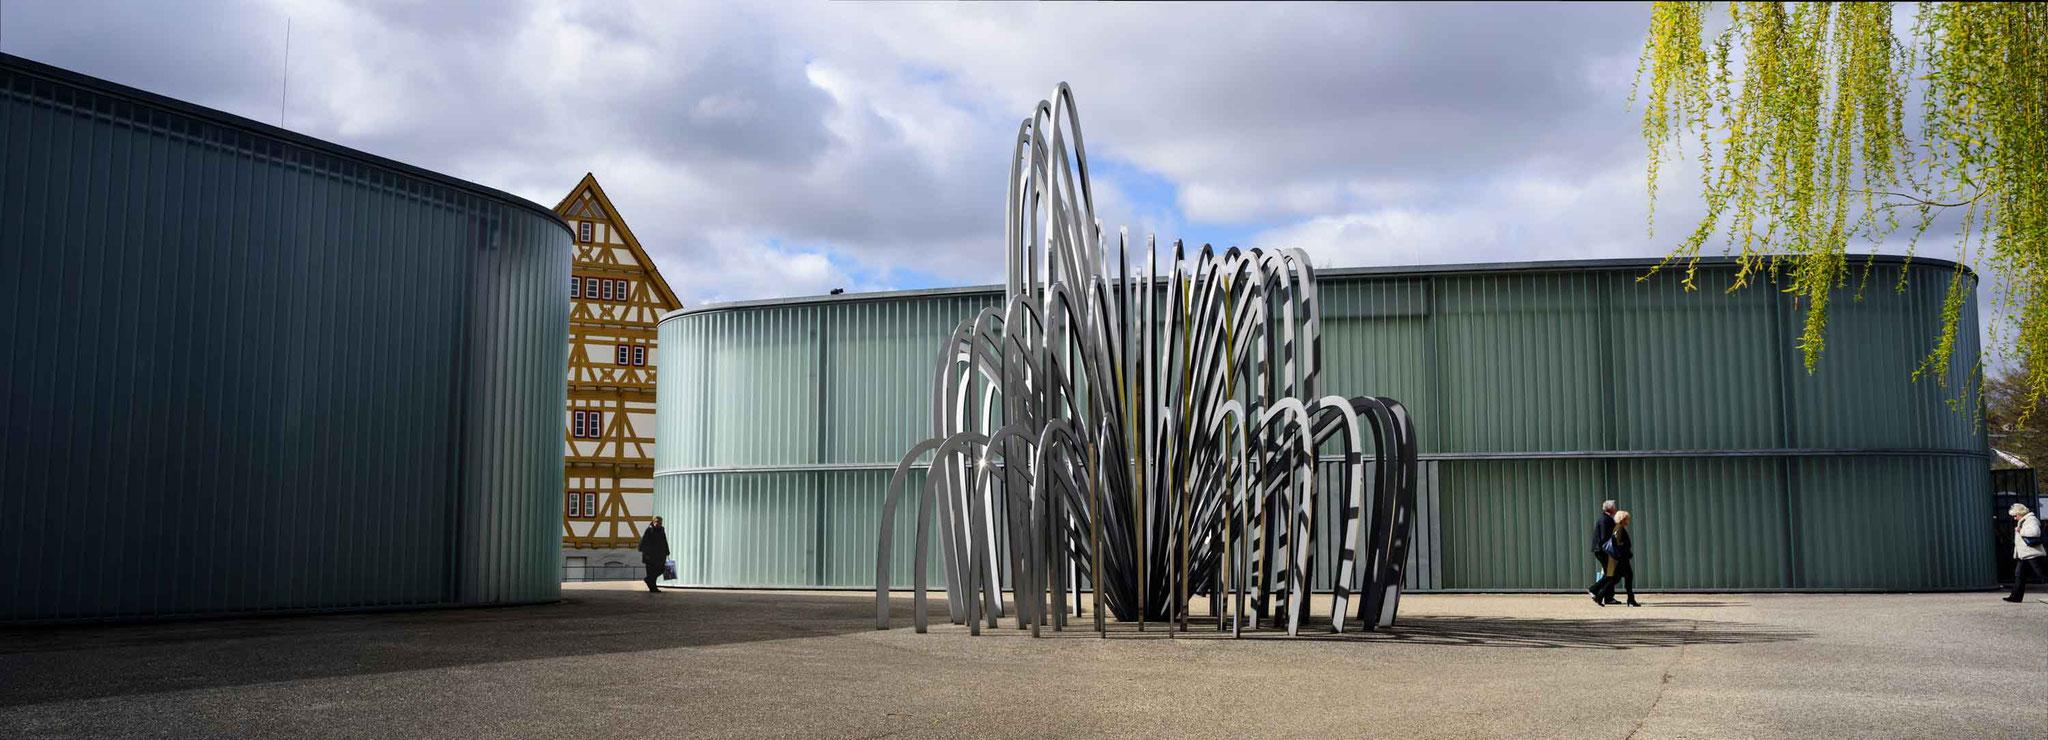 Stihl-Galerie Waiblingen